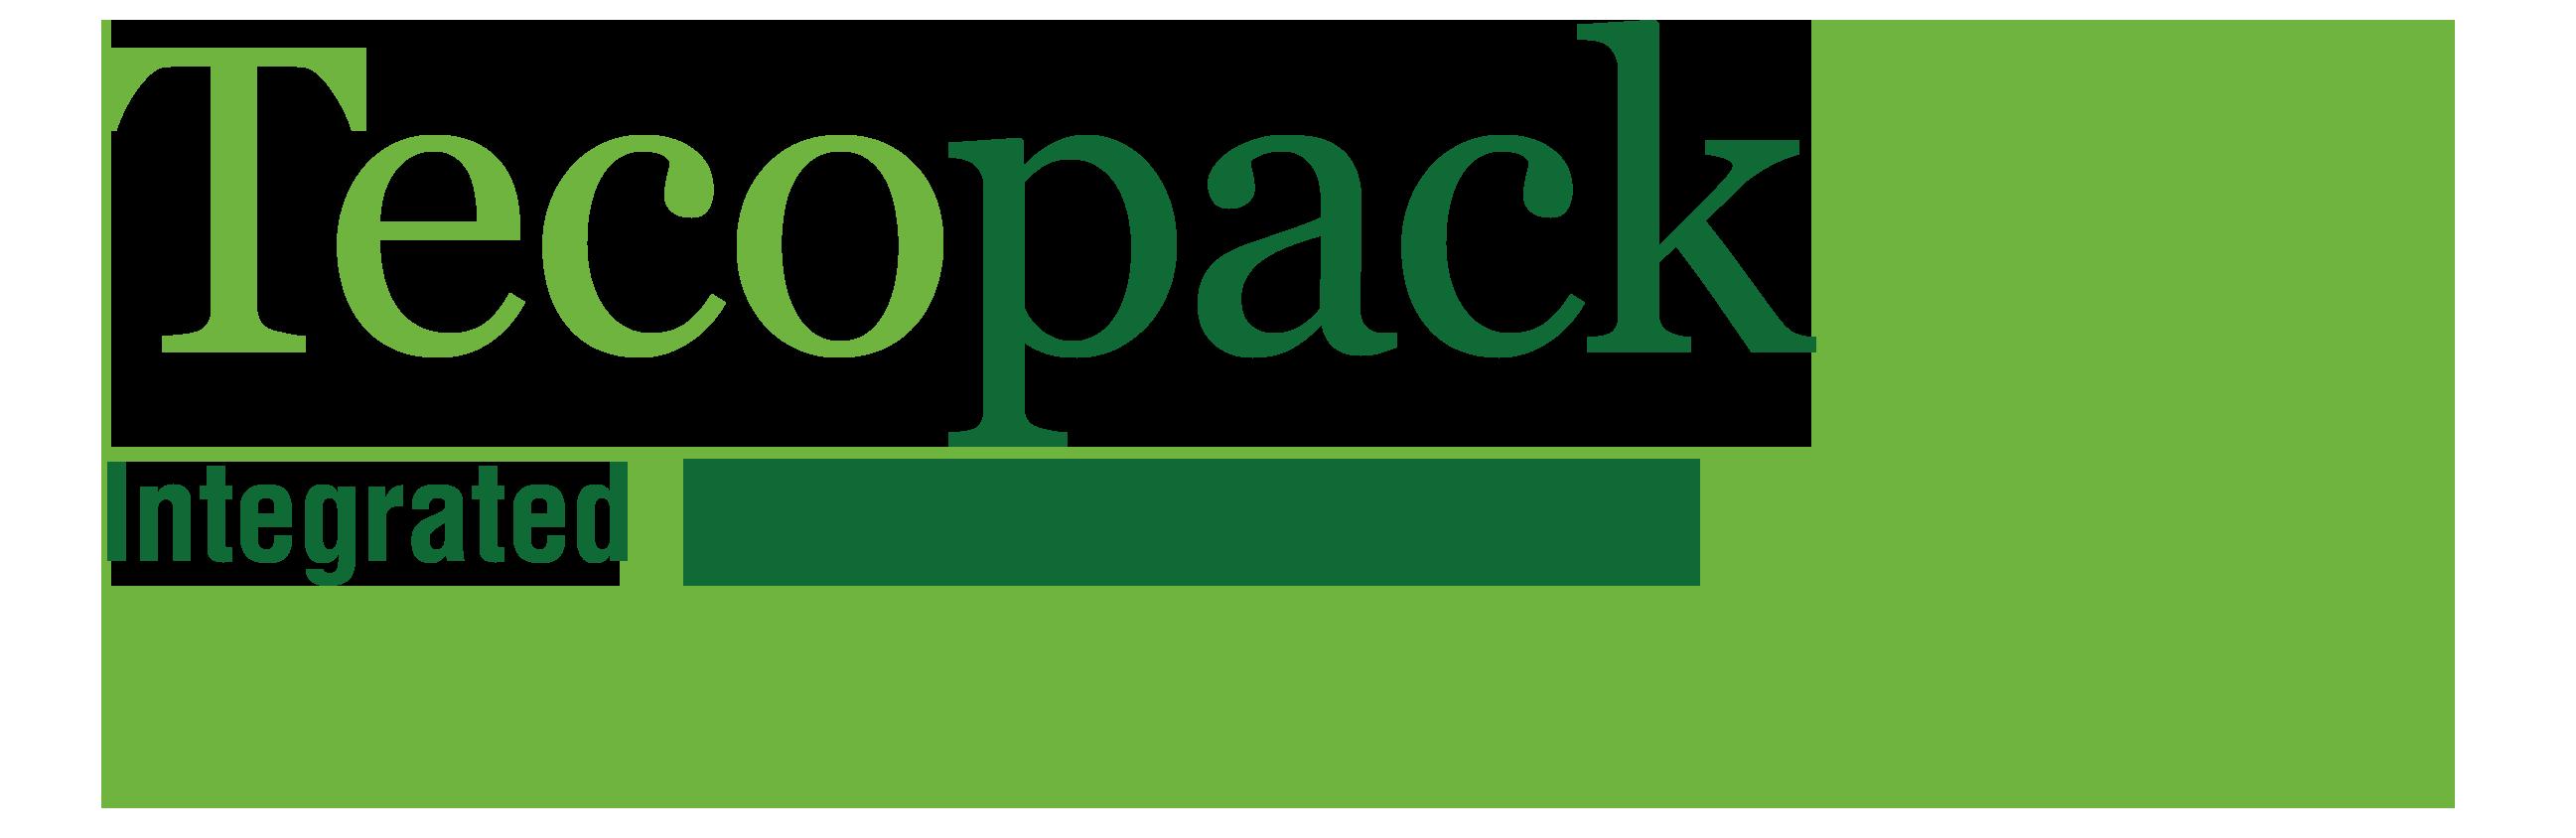 Tecopack